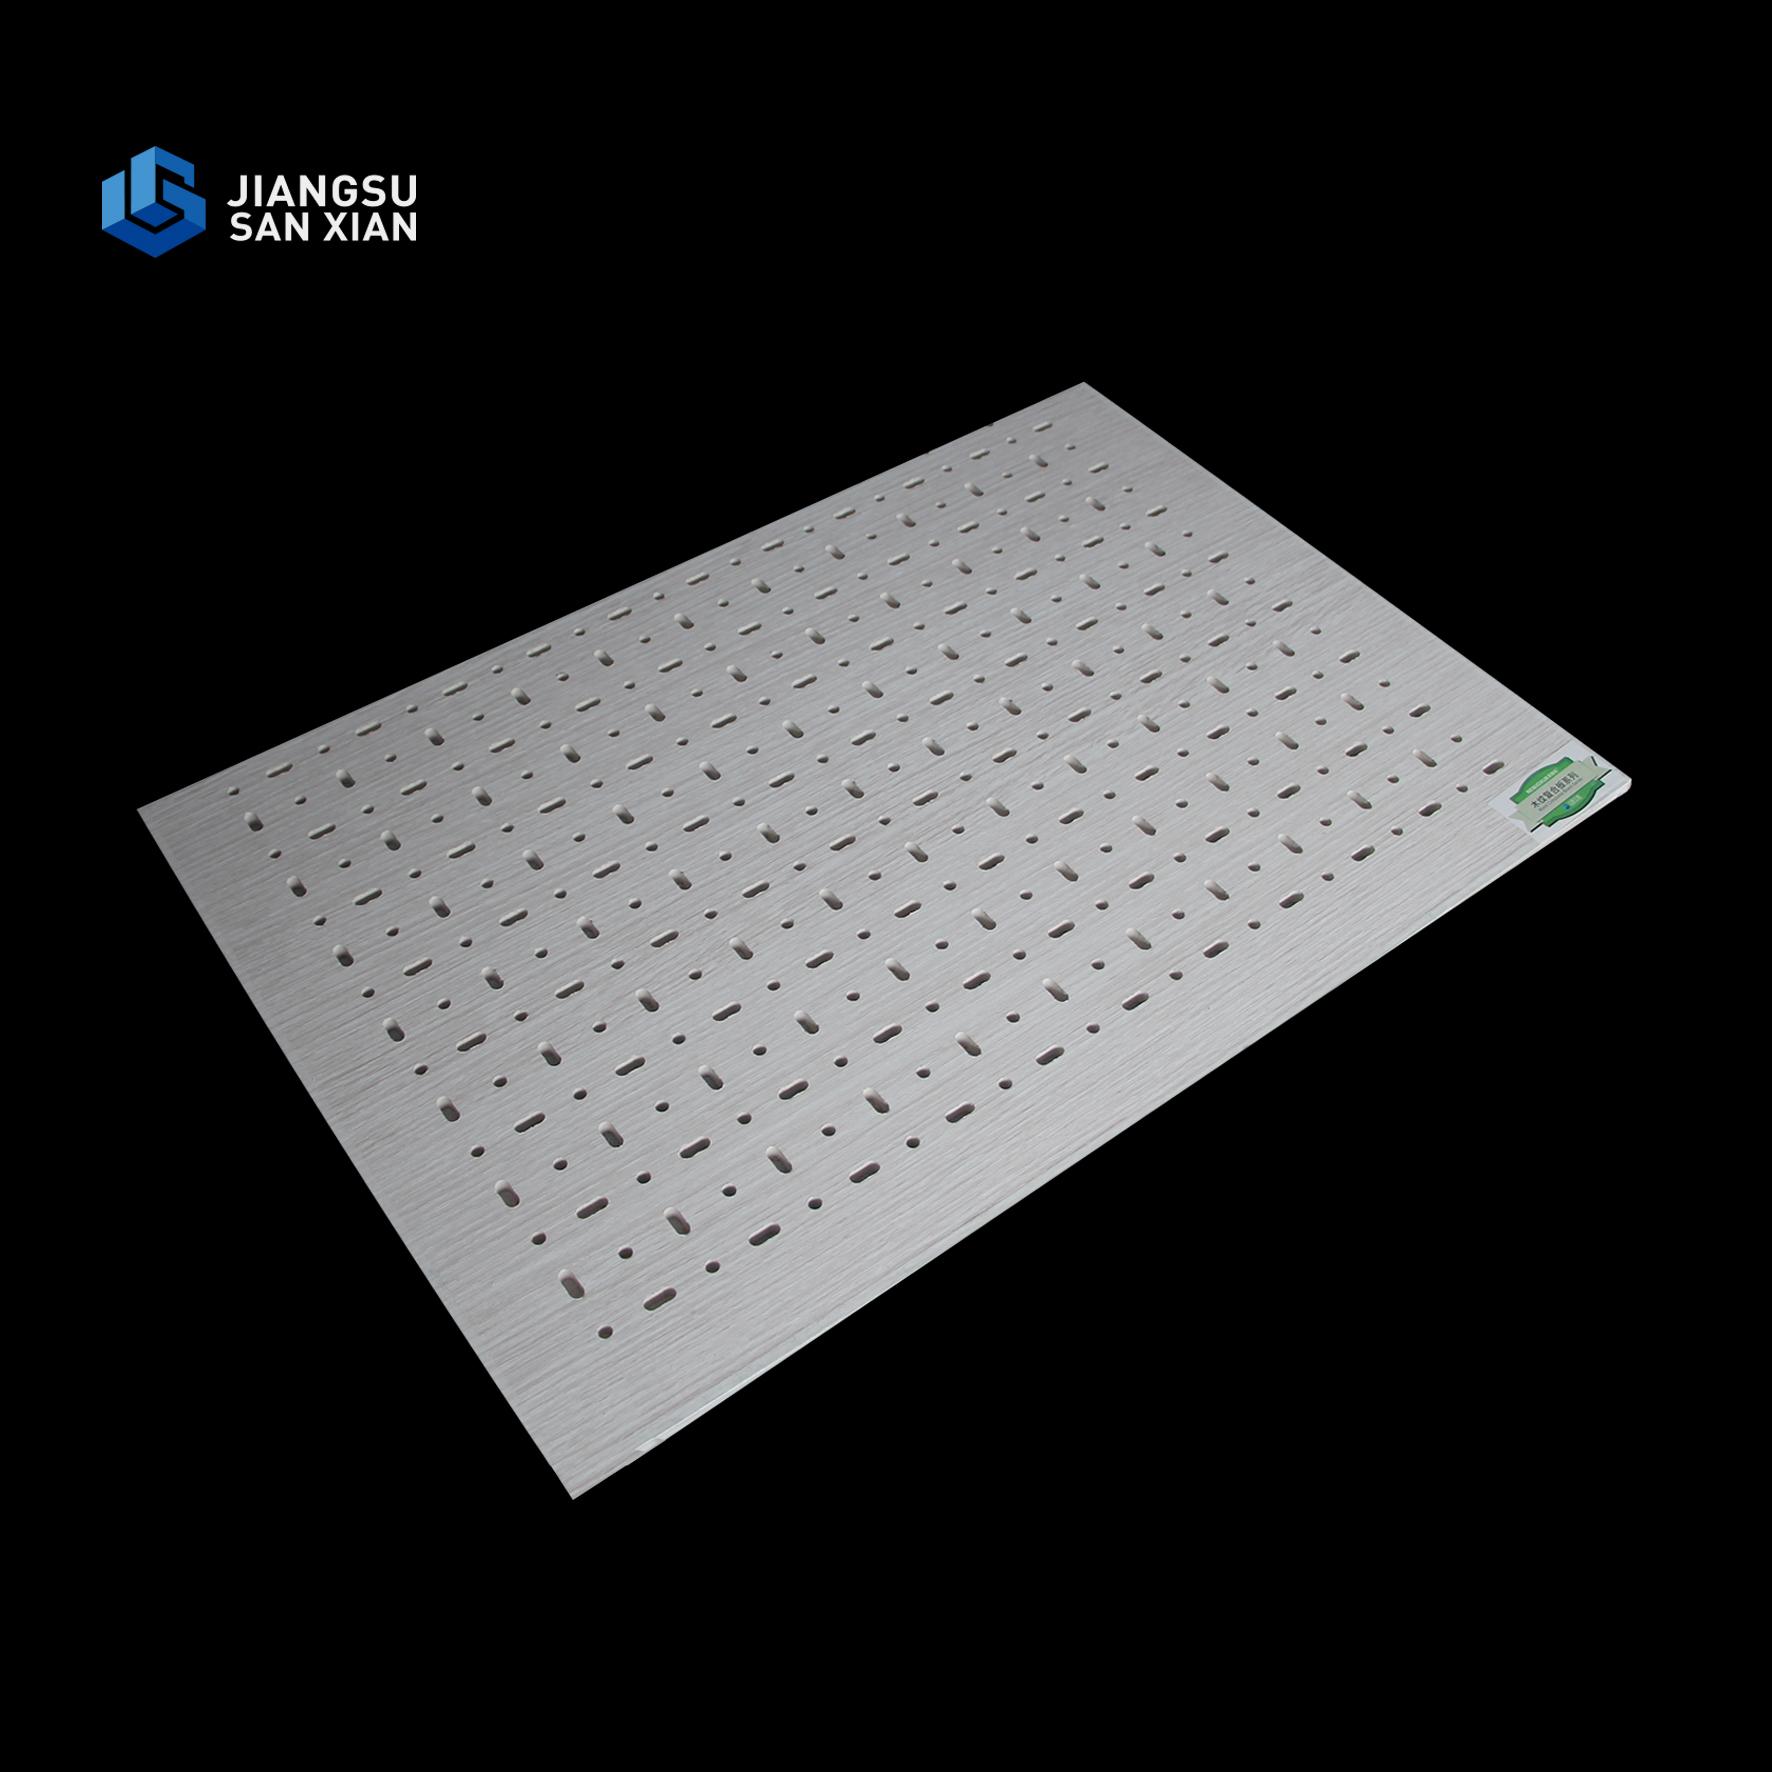 China Gypsum Board Manufacturers, China Gypsum Board Manufacturers